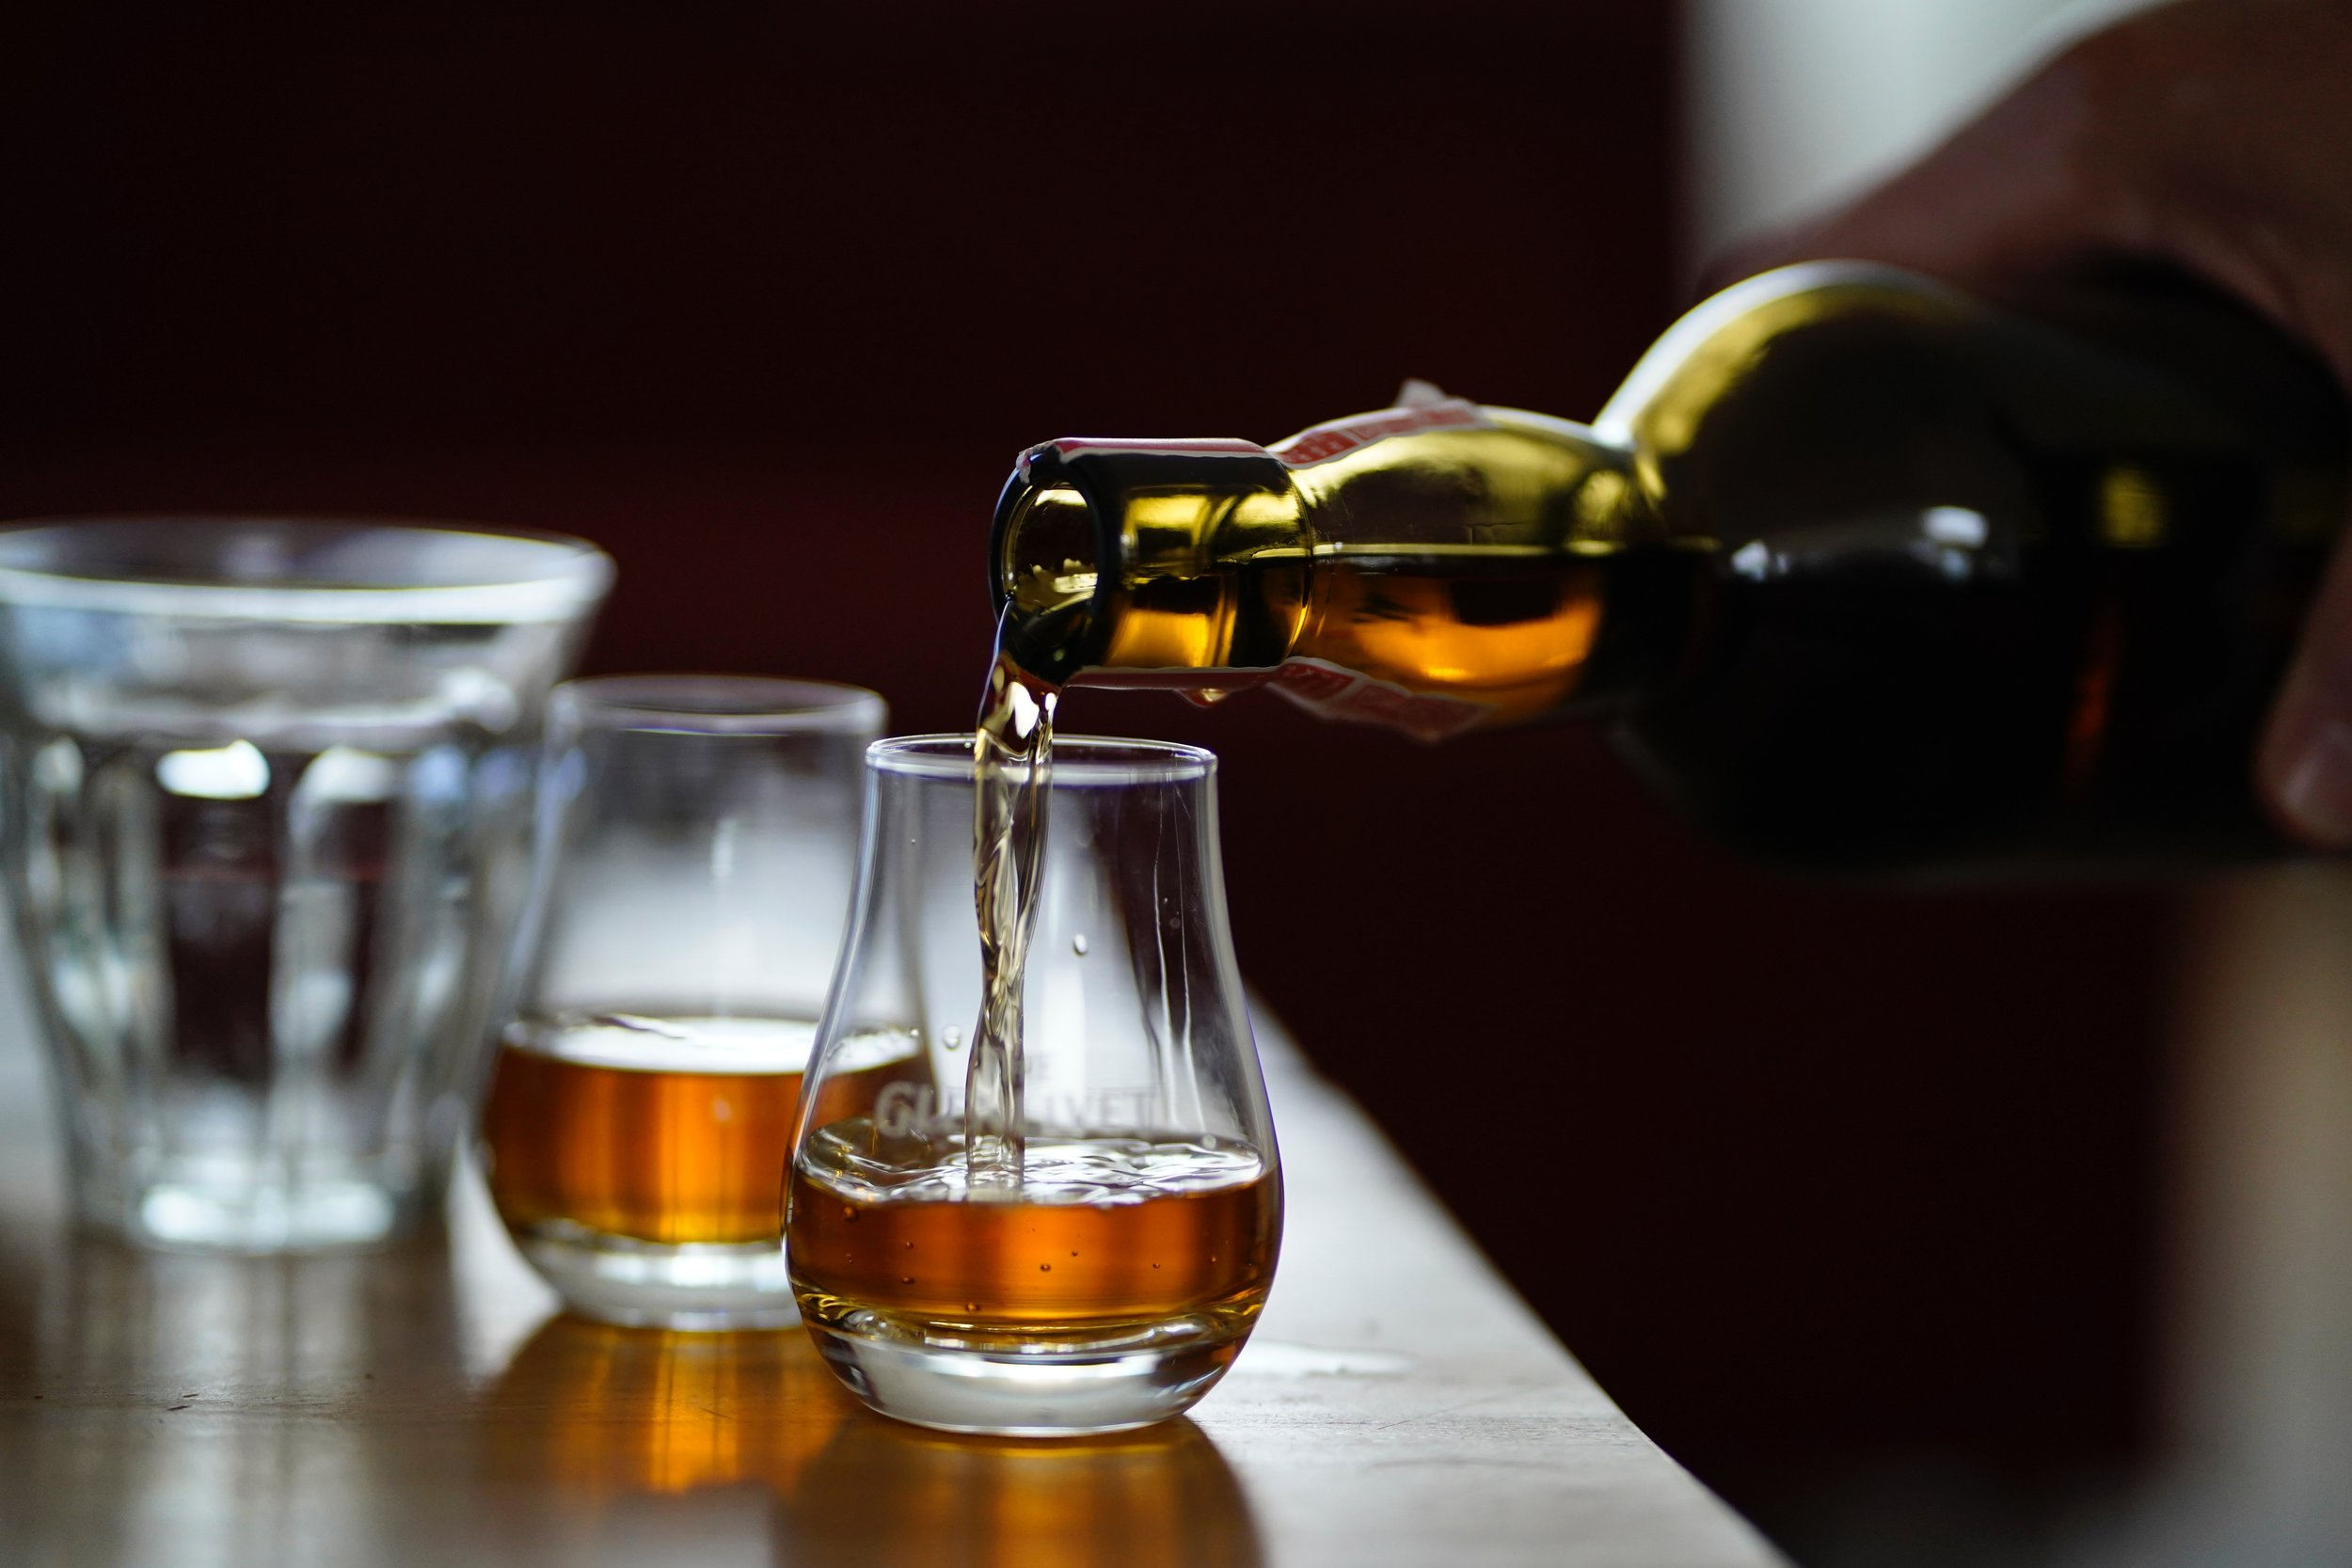 Talisker Distillery - The oldest working distillery set on shored of Loch Harport.